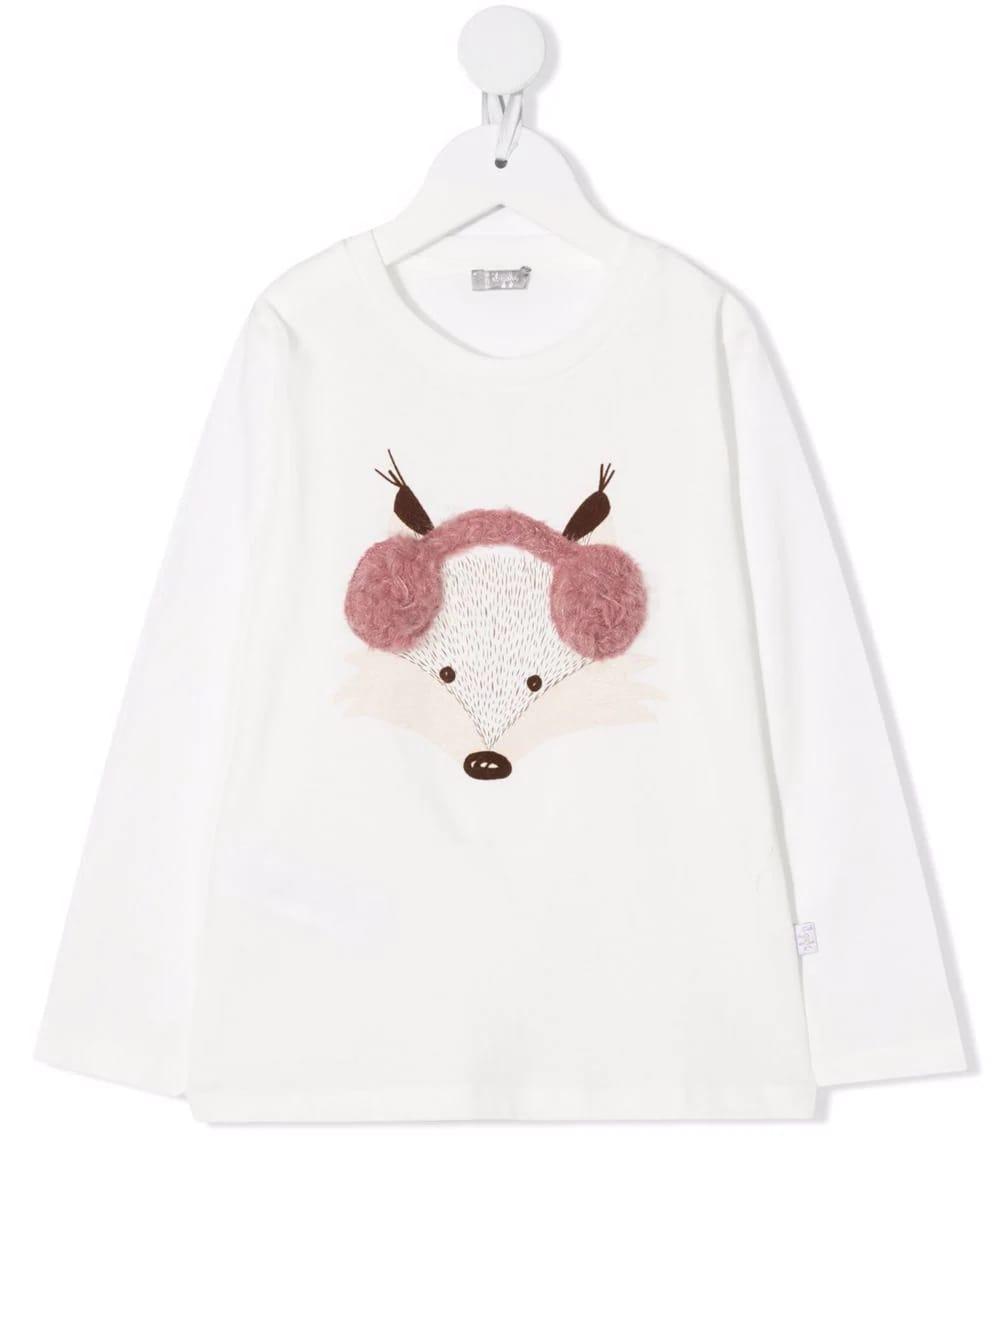 Kids White T-shirt Fox Print With Headphones